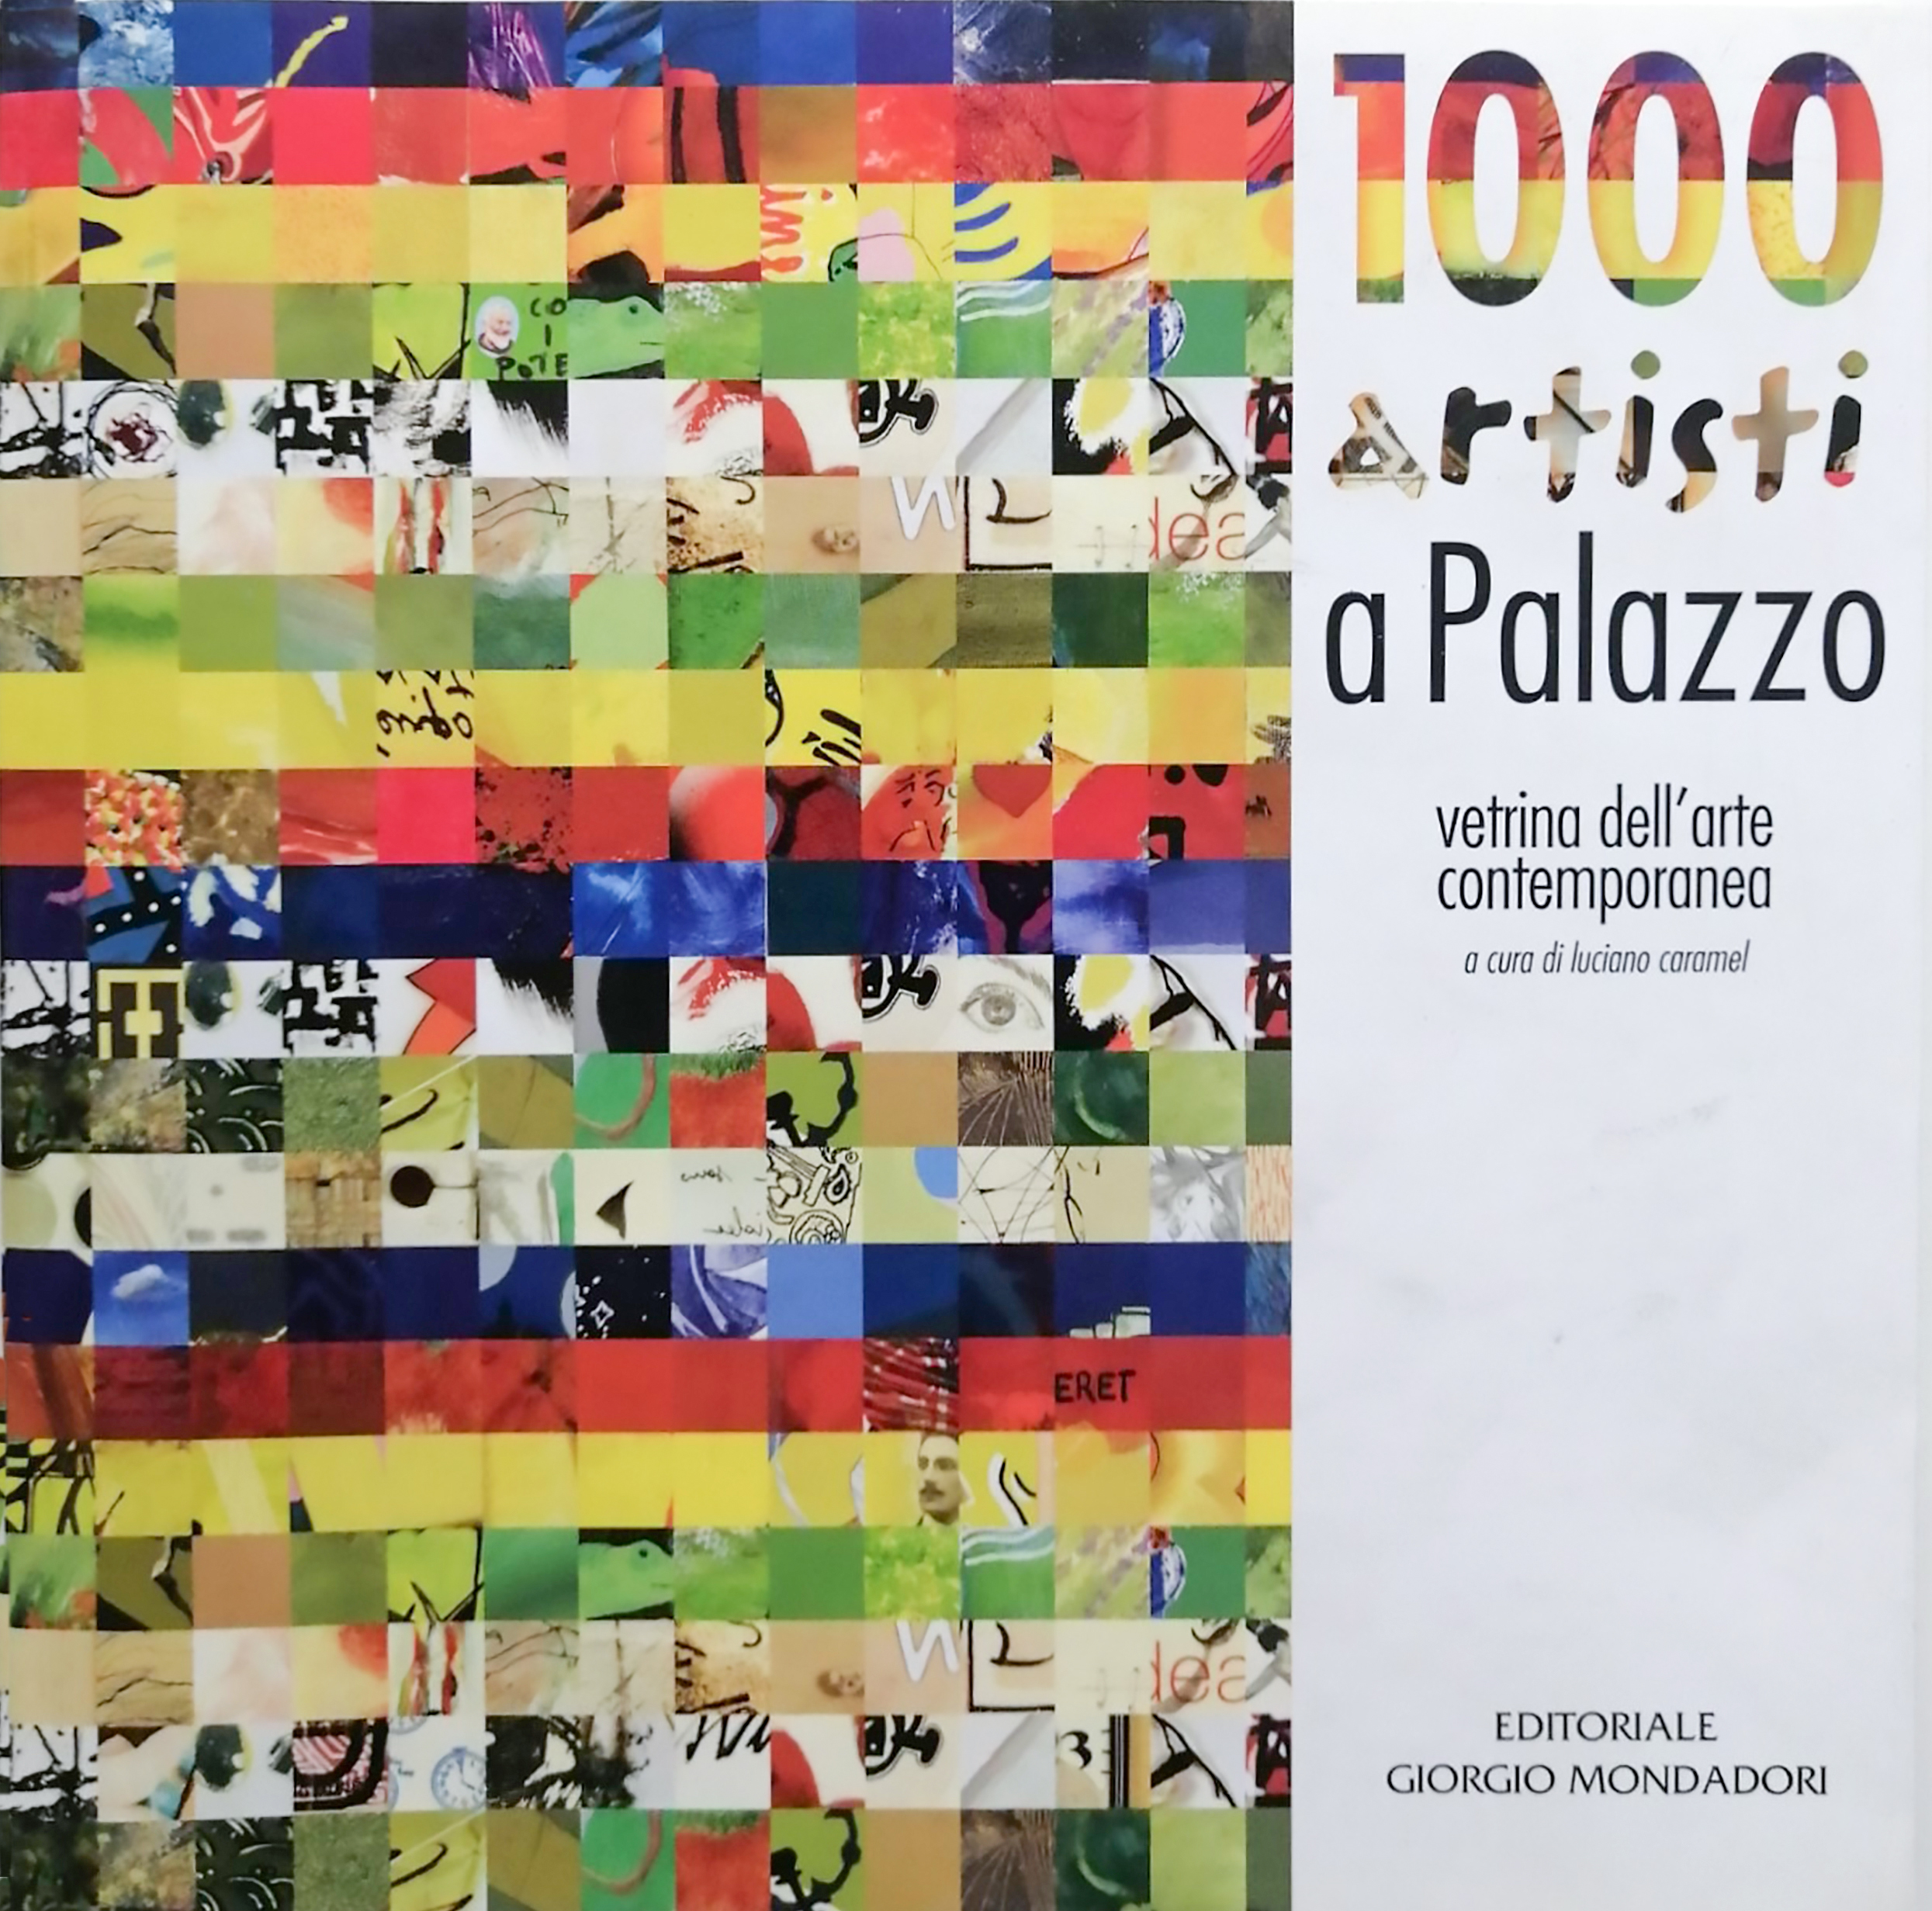 2009 1000 artisti a palazzo Palazzo Arese Borromeo Cesano Maderno - Bibliography/ Catalogues